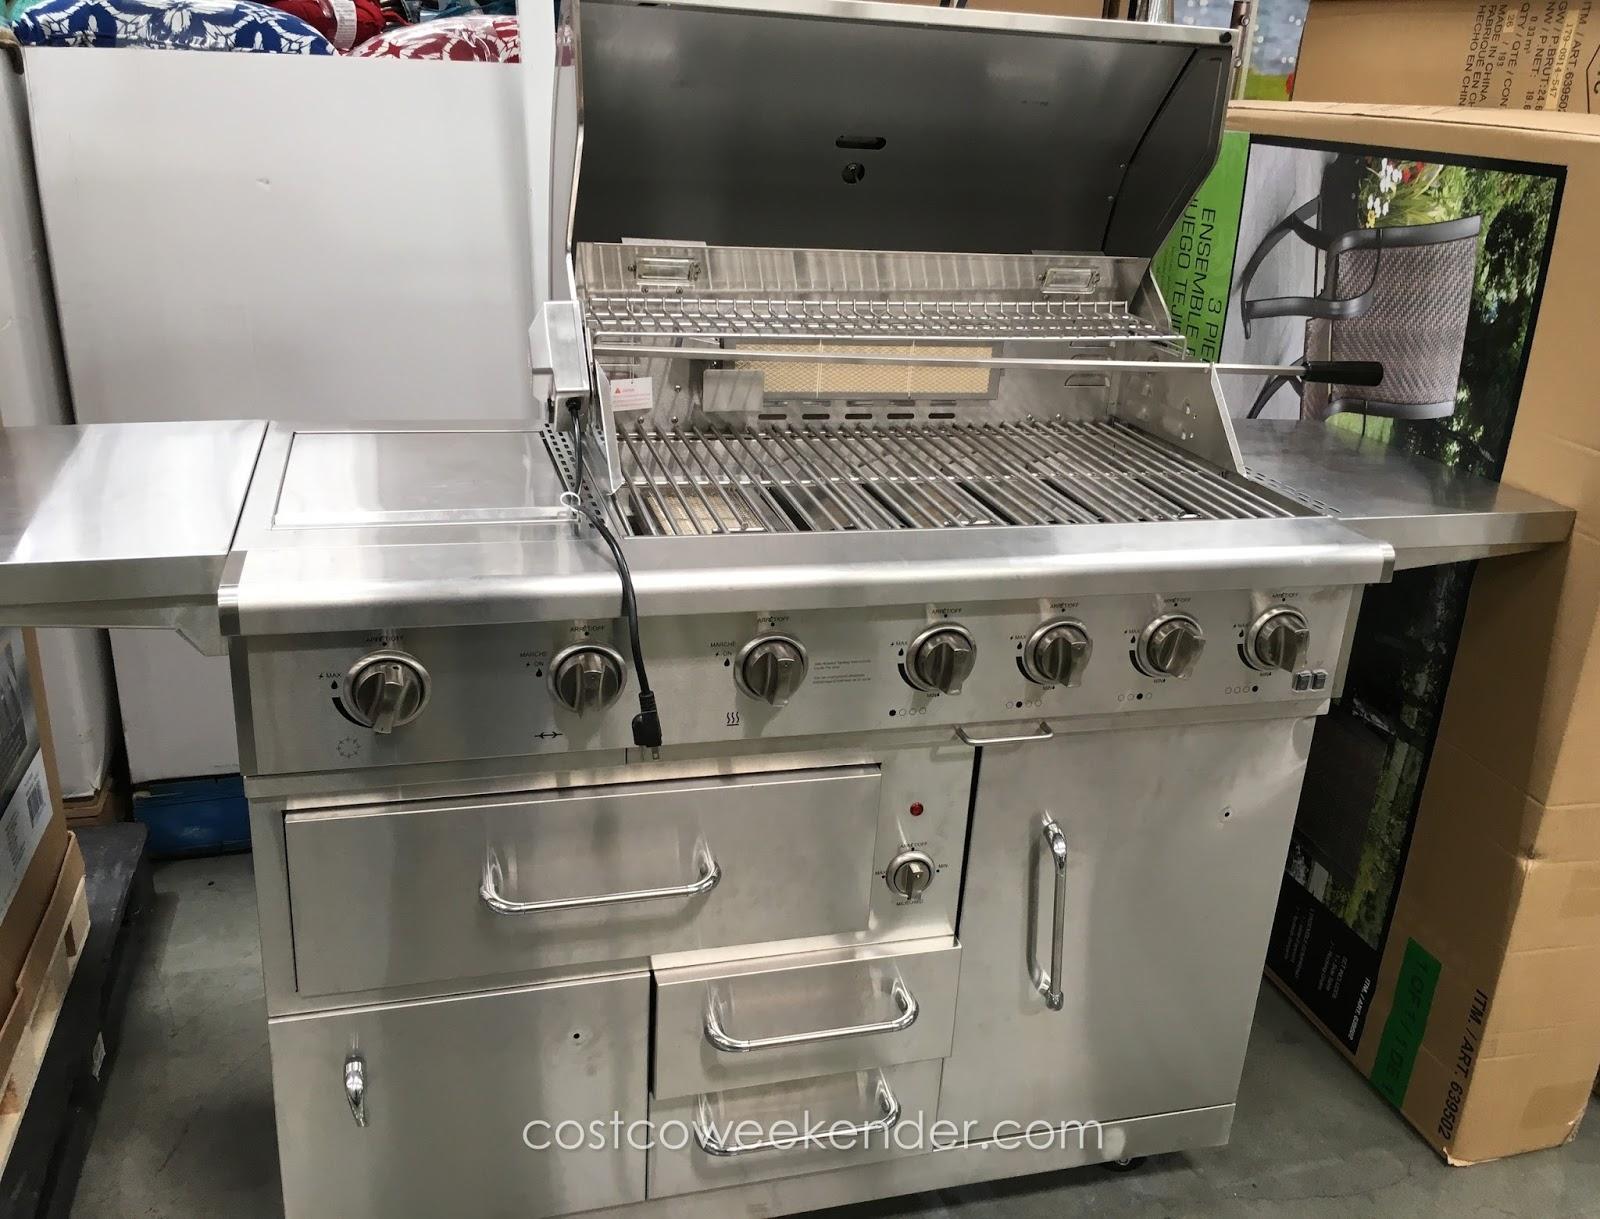 Nxr burner premium stainless steel propane gas grill